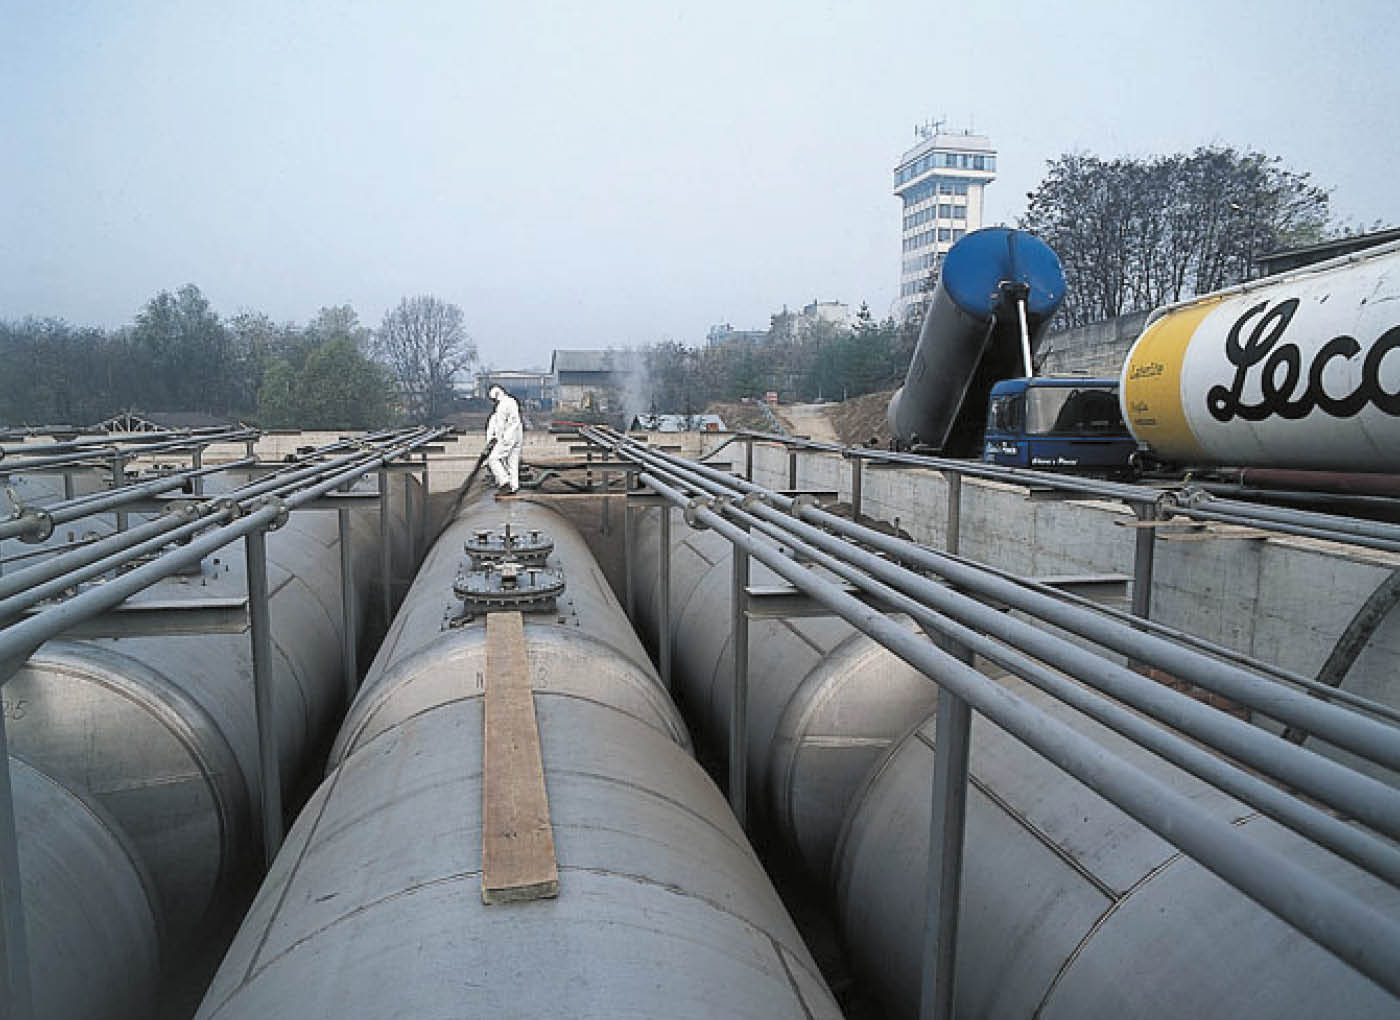 messa-in-sicurezza-cisterne-AG5-3